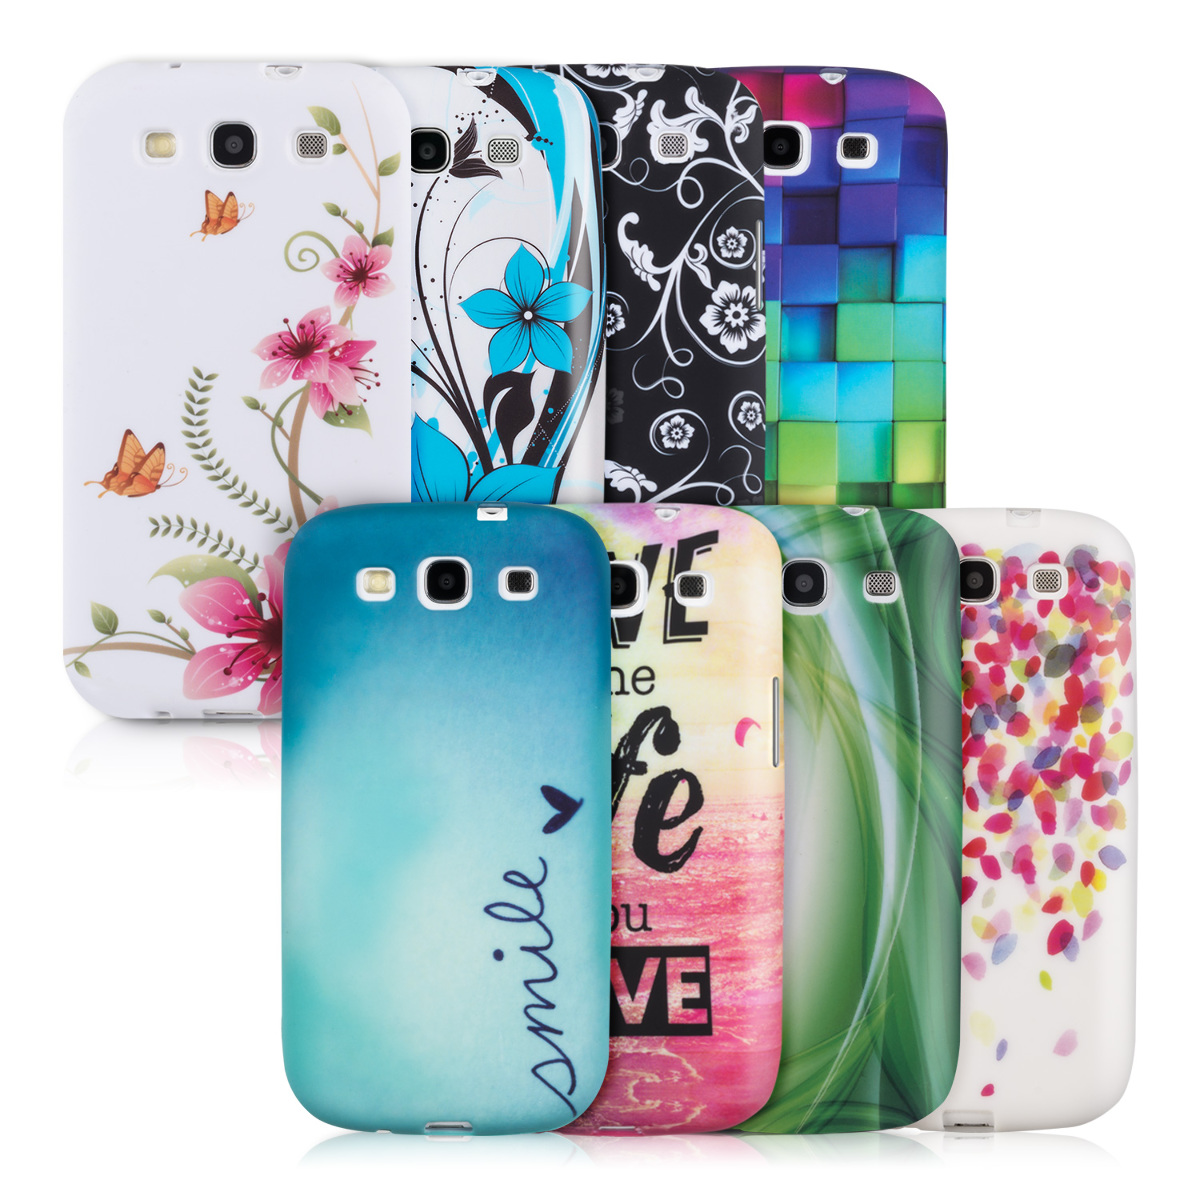 Tpu samsung galaxy s3 s3 neo - Kwmobile Tpu Silicone Case For Samsung Galaxy S3 S3 Neo Design Desired Colour Stylish Designer Case Made Of Premium Soft Tpu